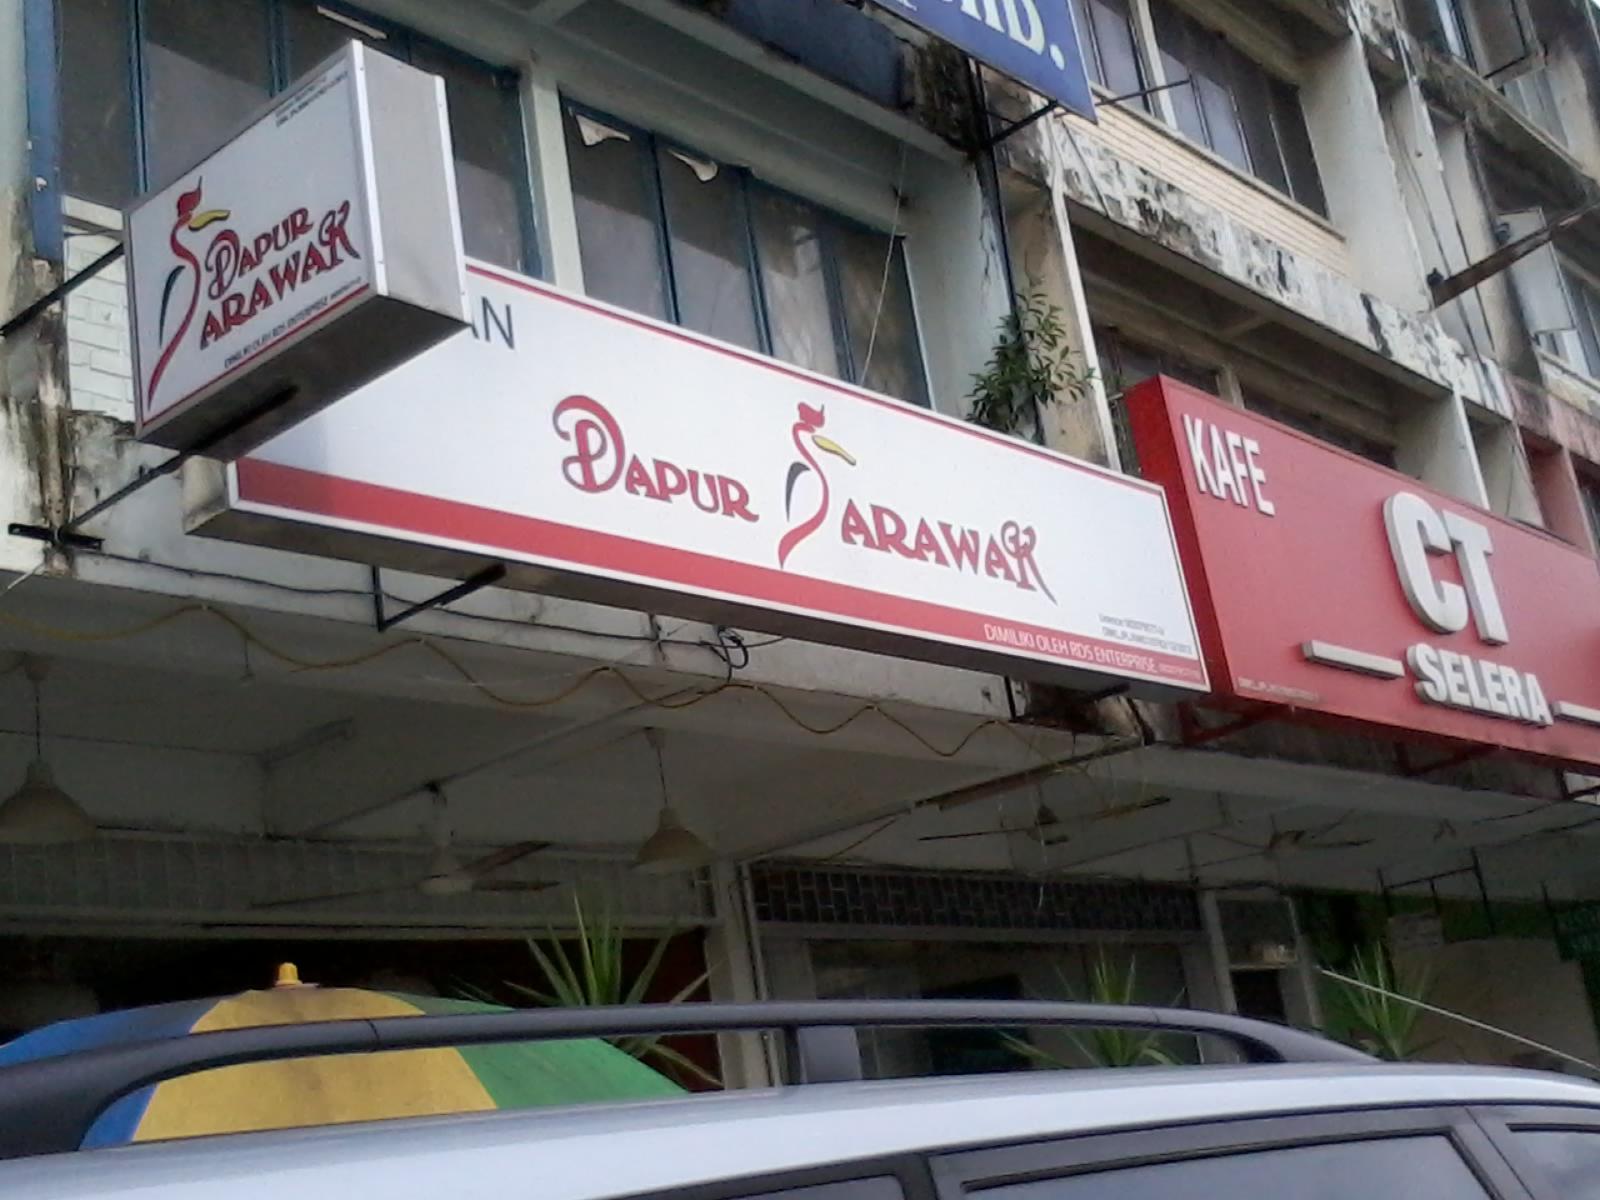 Kedai Dapur Sarawak Ni Pemiliknya Pelakon Mahmud Ali Basha Tu Makanan Not Bad Rasa Masih Ada Originality And Harga Standard Kl Ye